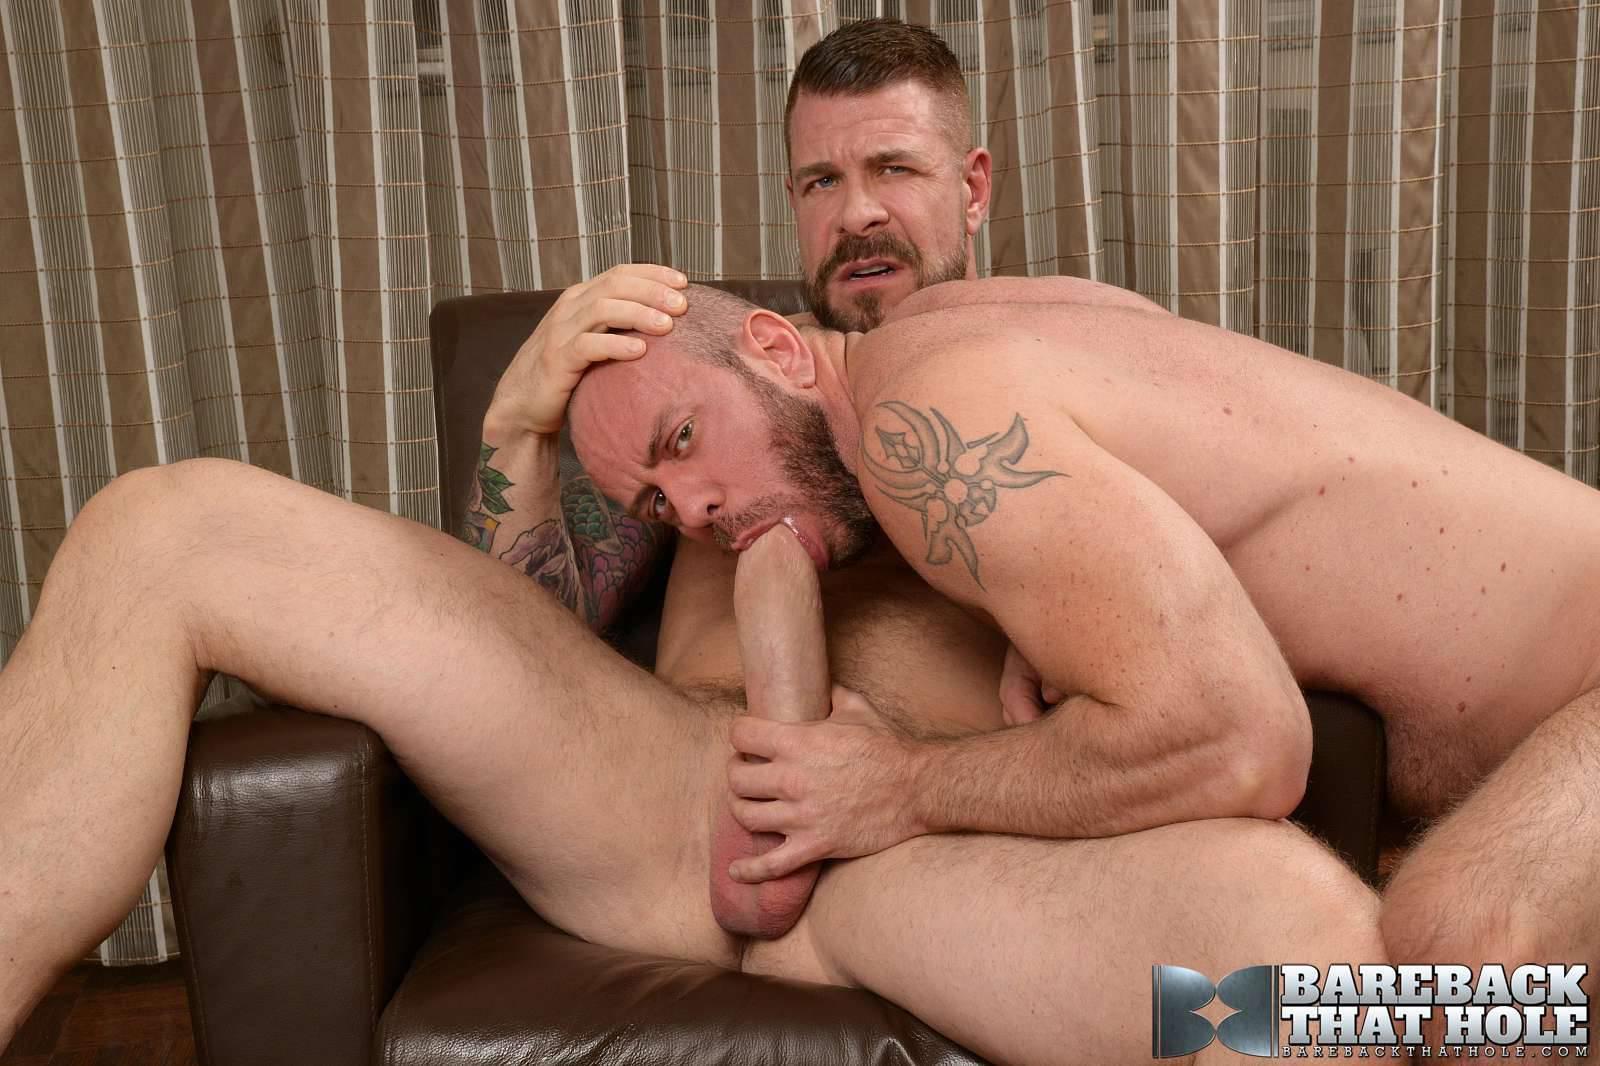 Bareback-That-Hole-Rocco-Steele-and-Matt-Stevens-Hairy-Muscle-Daddy-Bareback-Amateur-Gay-Porn-20 Hairy Muscle Daddy Rocco Steele Breeding Matt Stevens